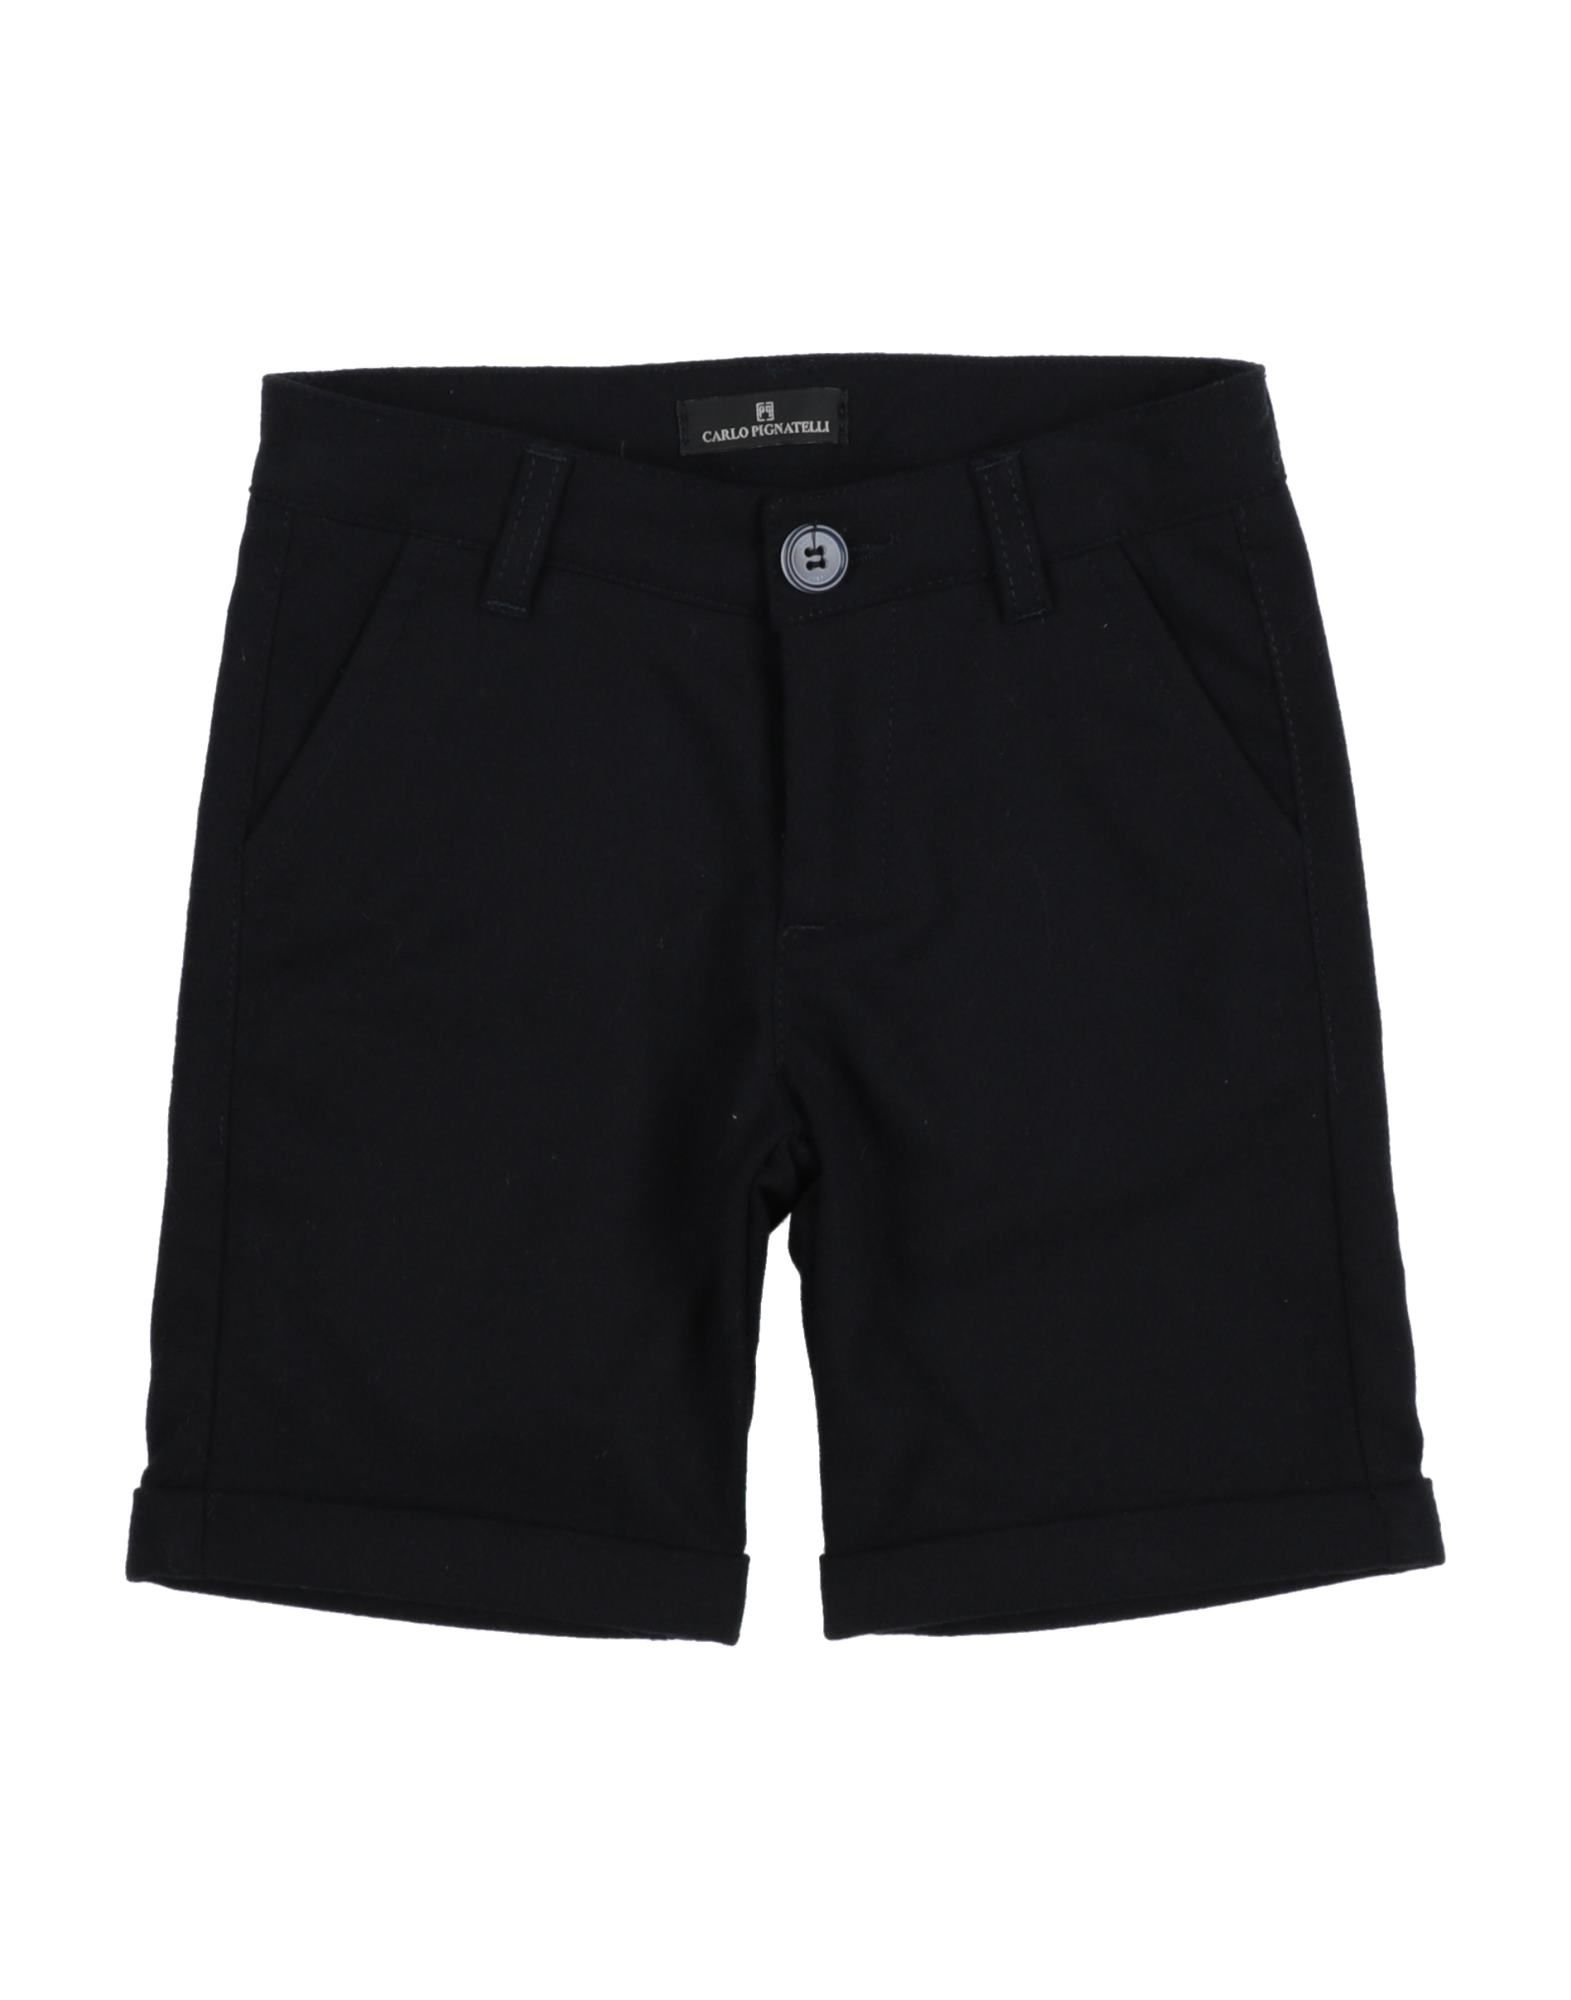 Carlo Pignatelli Kids' Casual Pants In Black